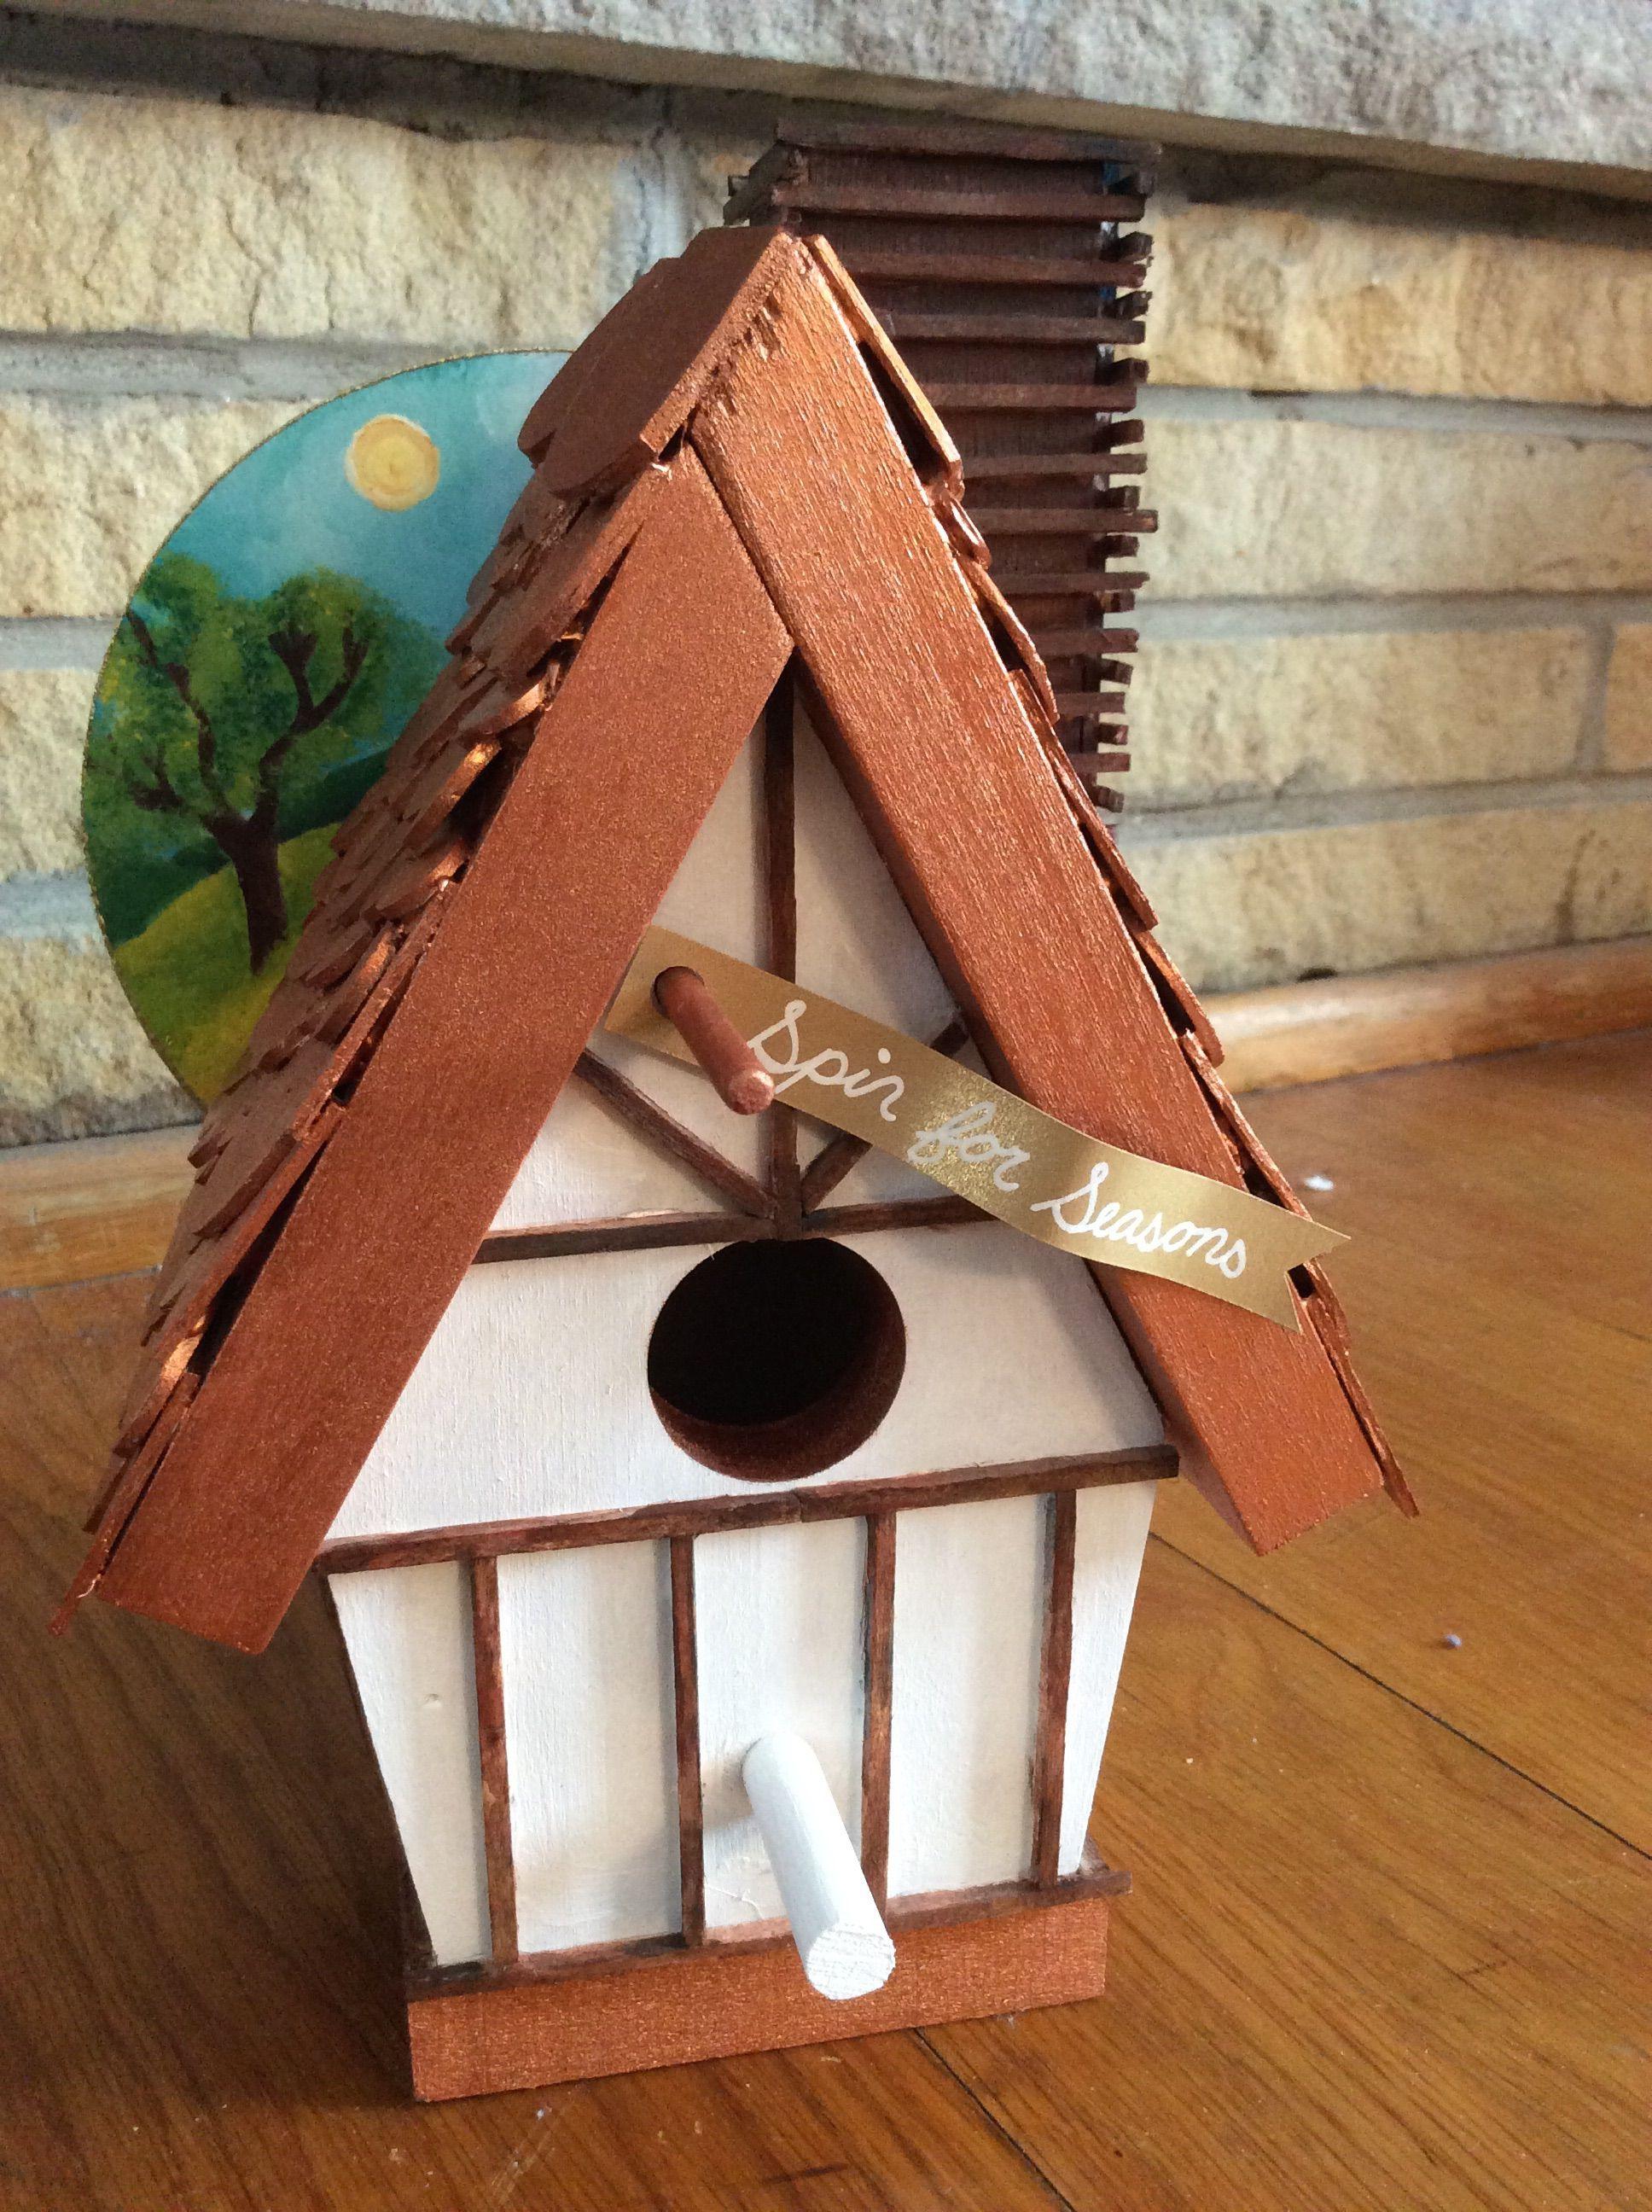 Birdhouse 2015 - Spring